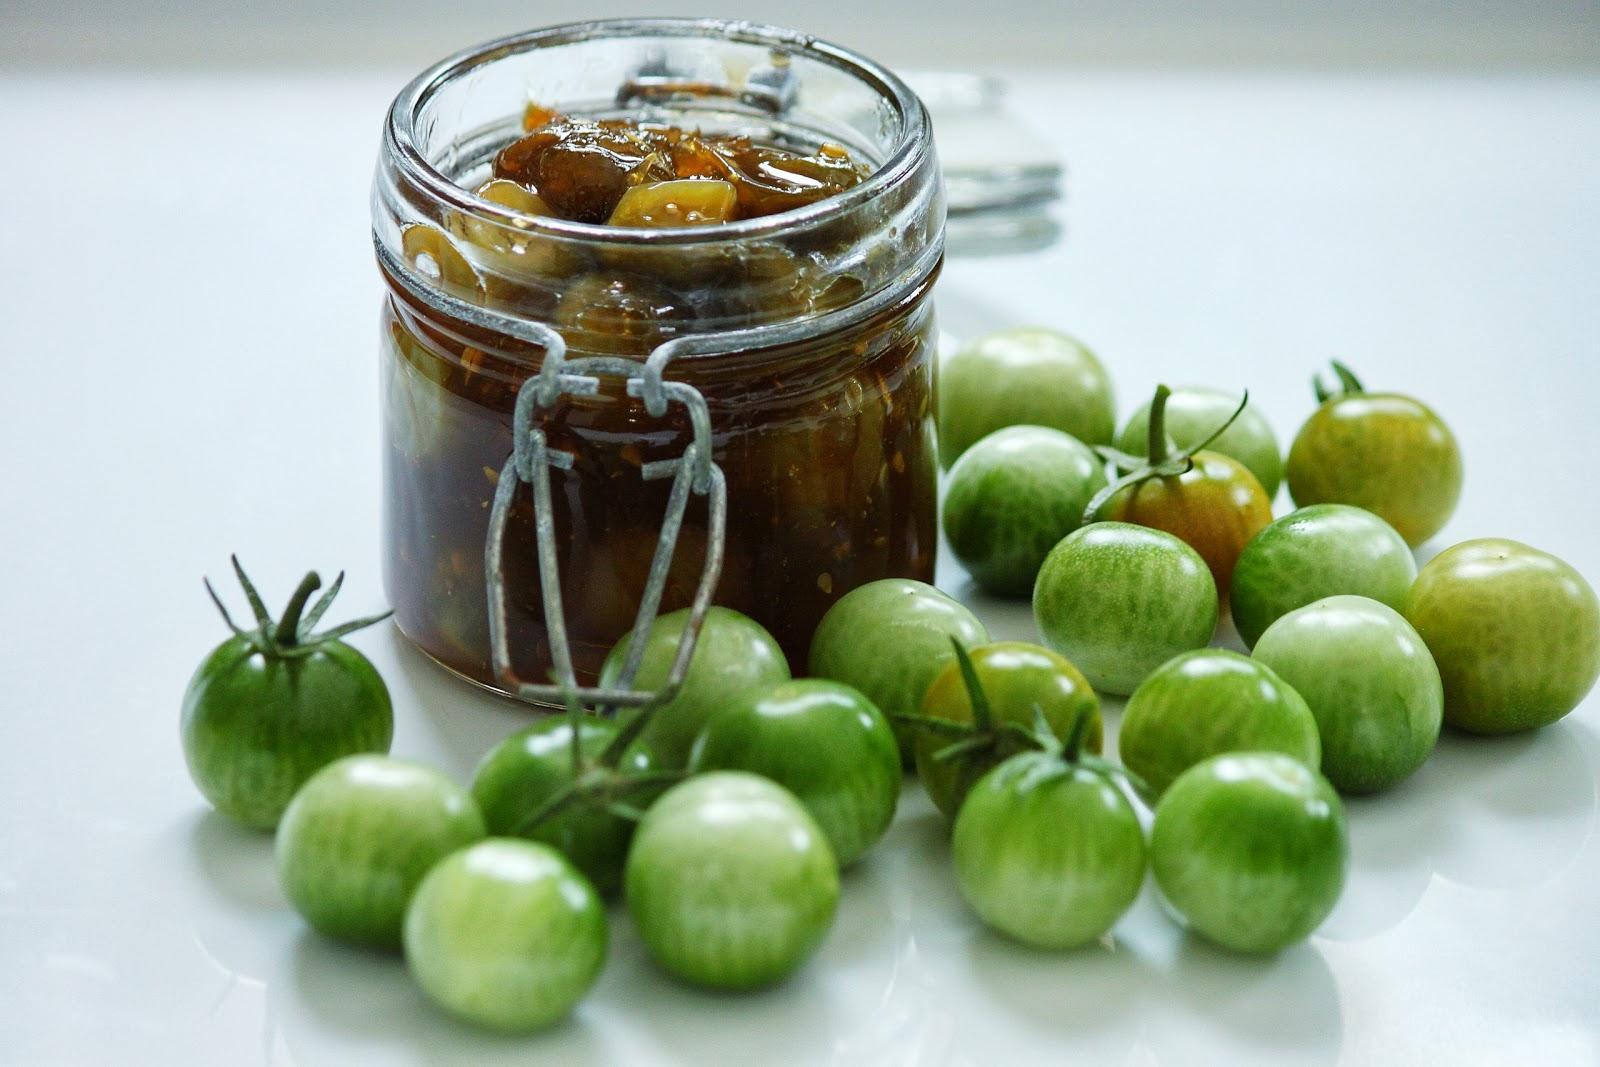 chutney de tomates cerises vertes au gingembre sof vous invite. Black Bedroom Furniture Sets. Home Design Ideas